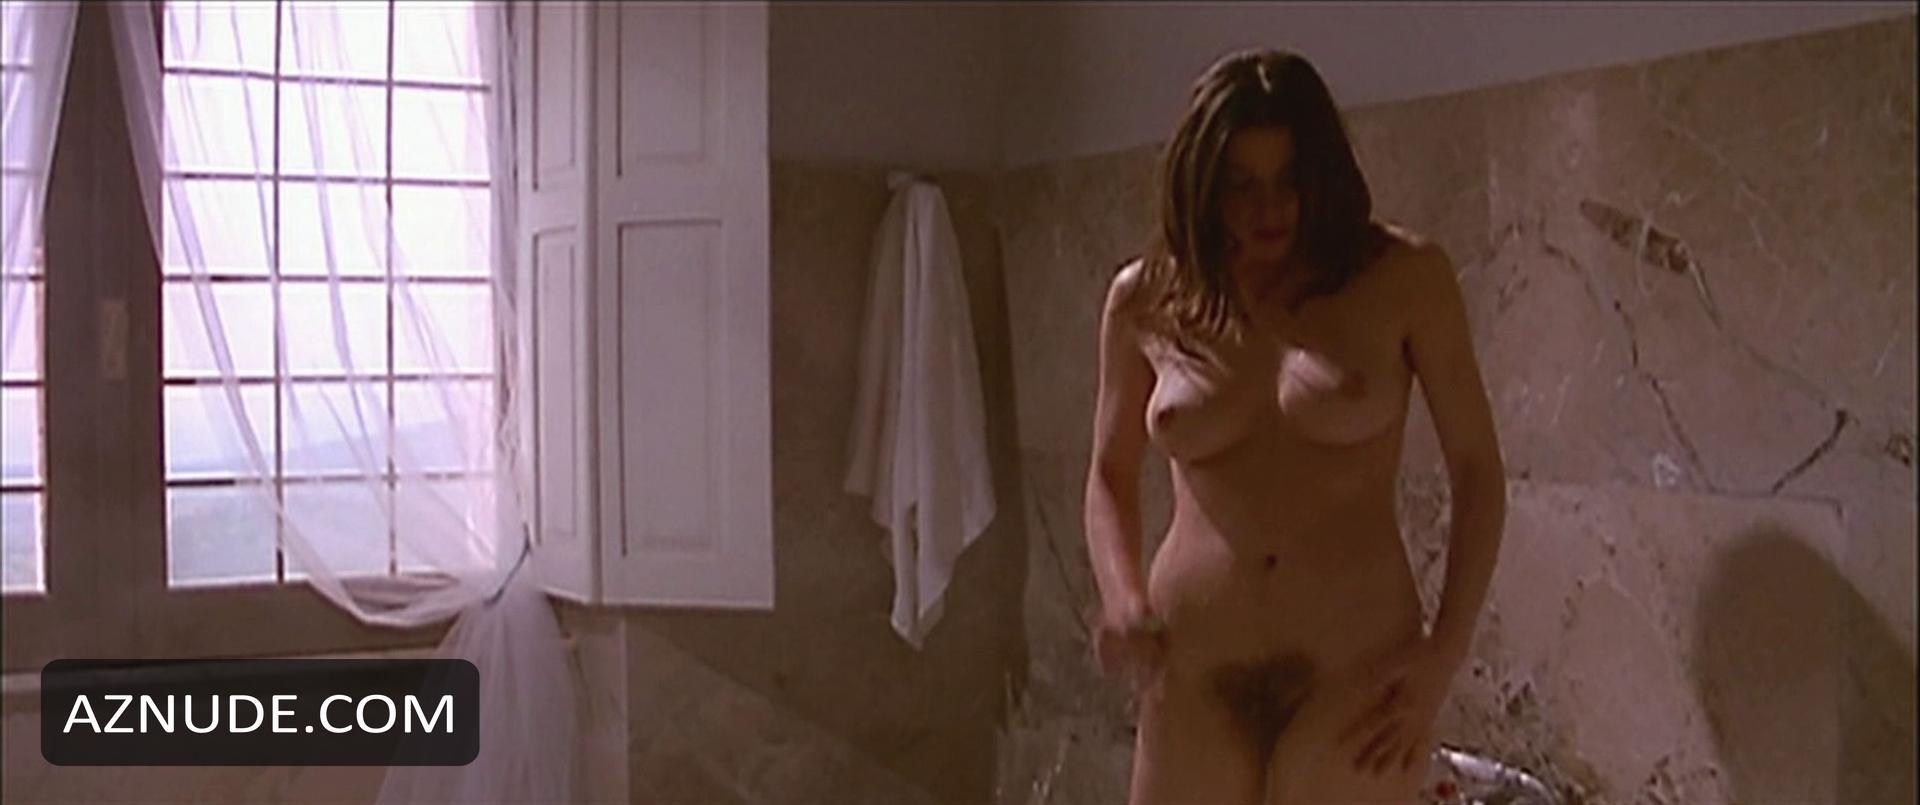 free Hot movie clip nude